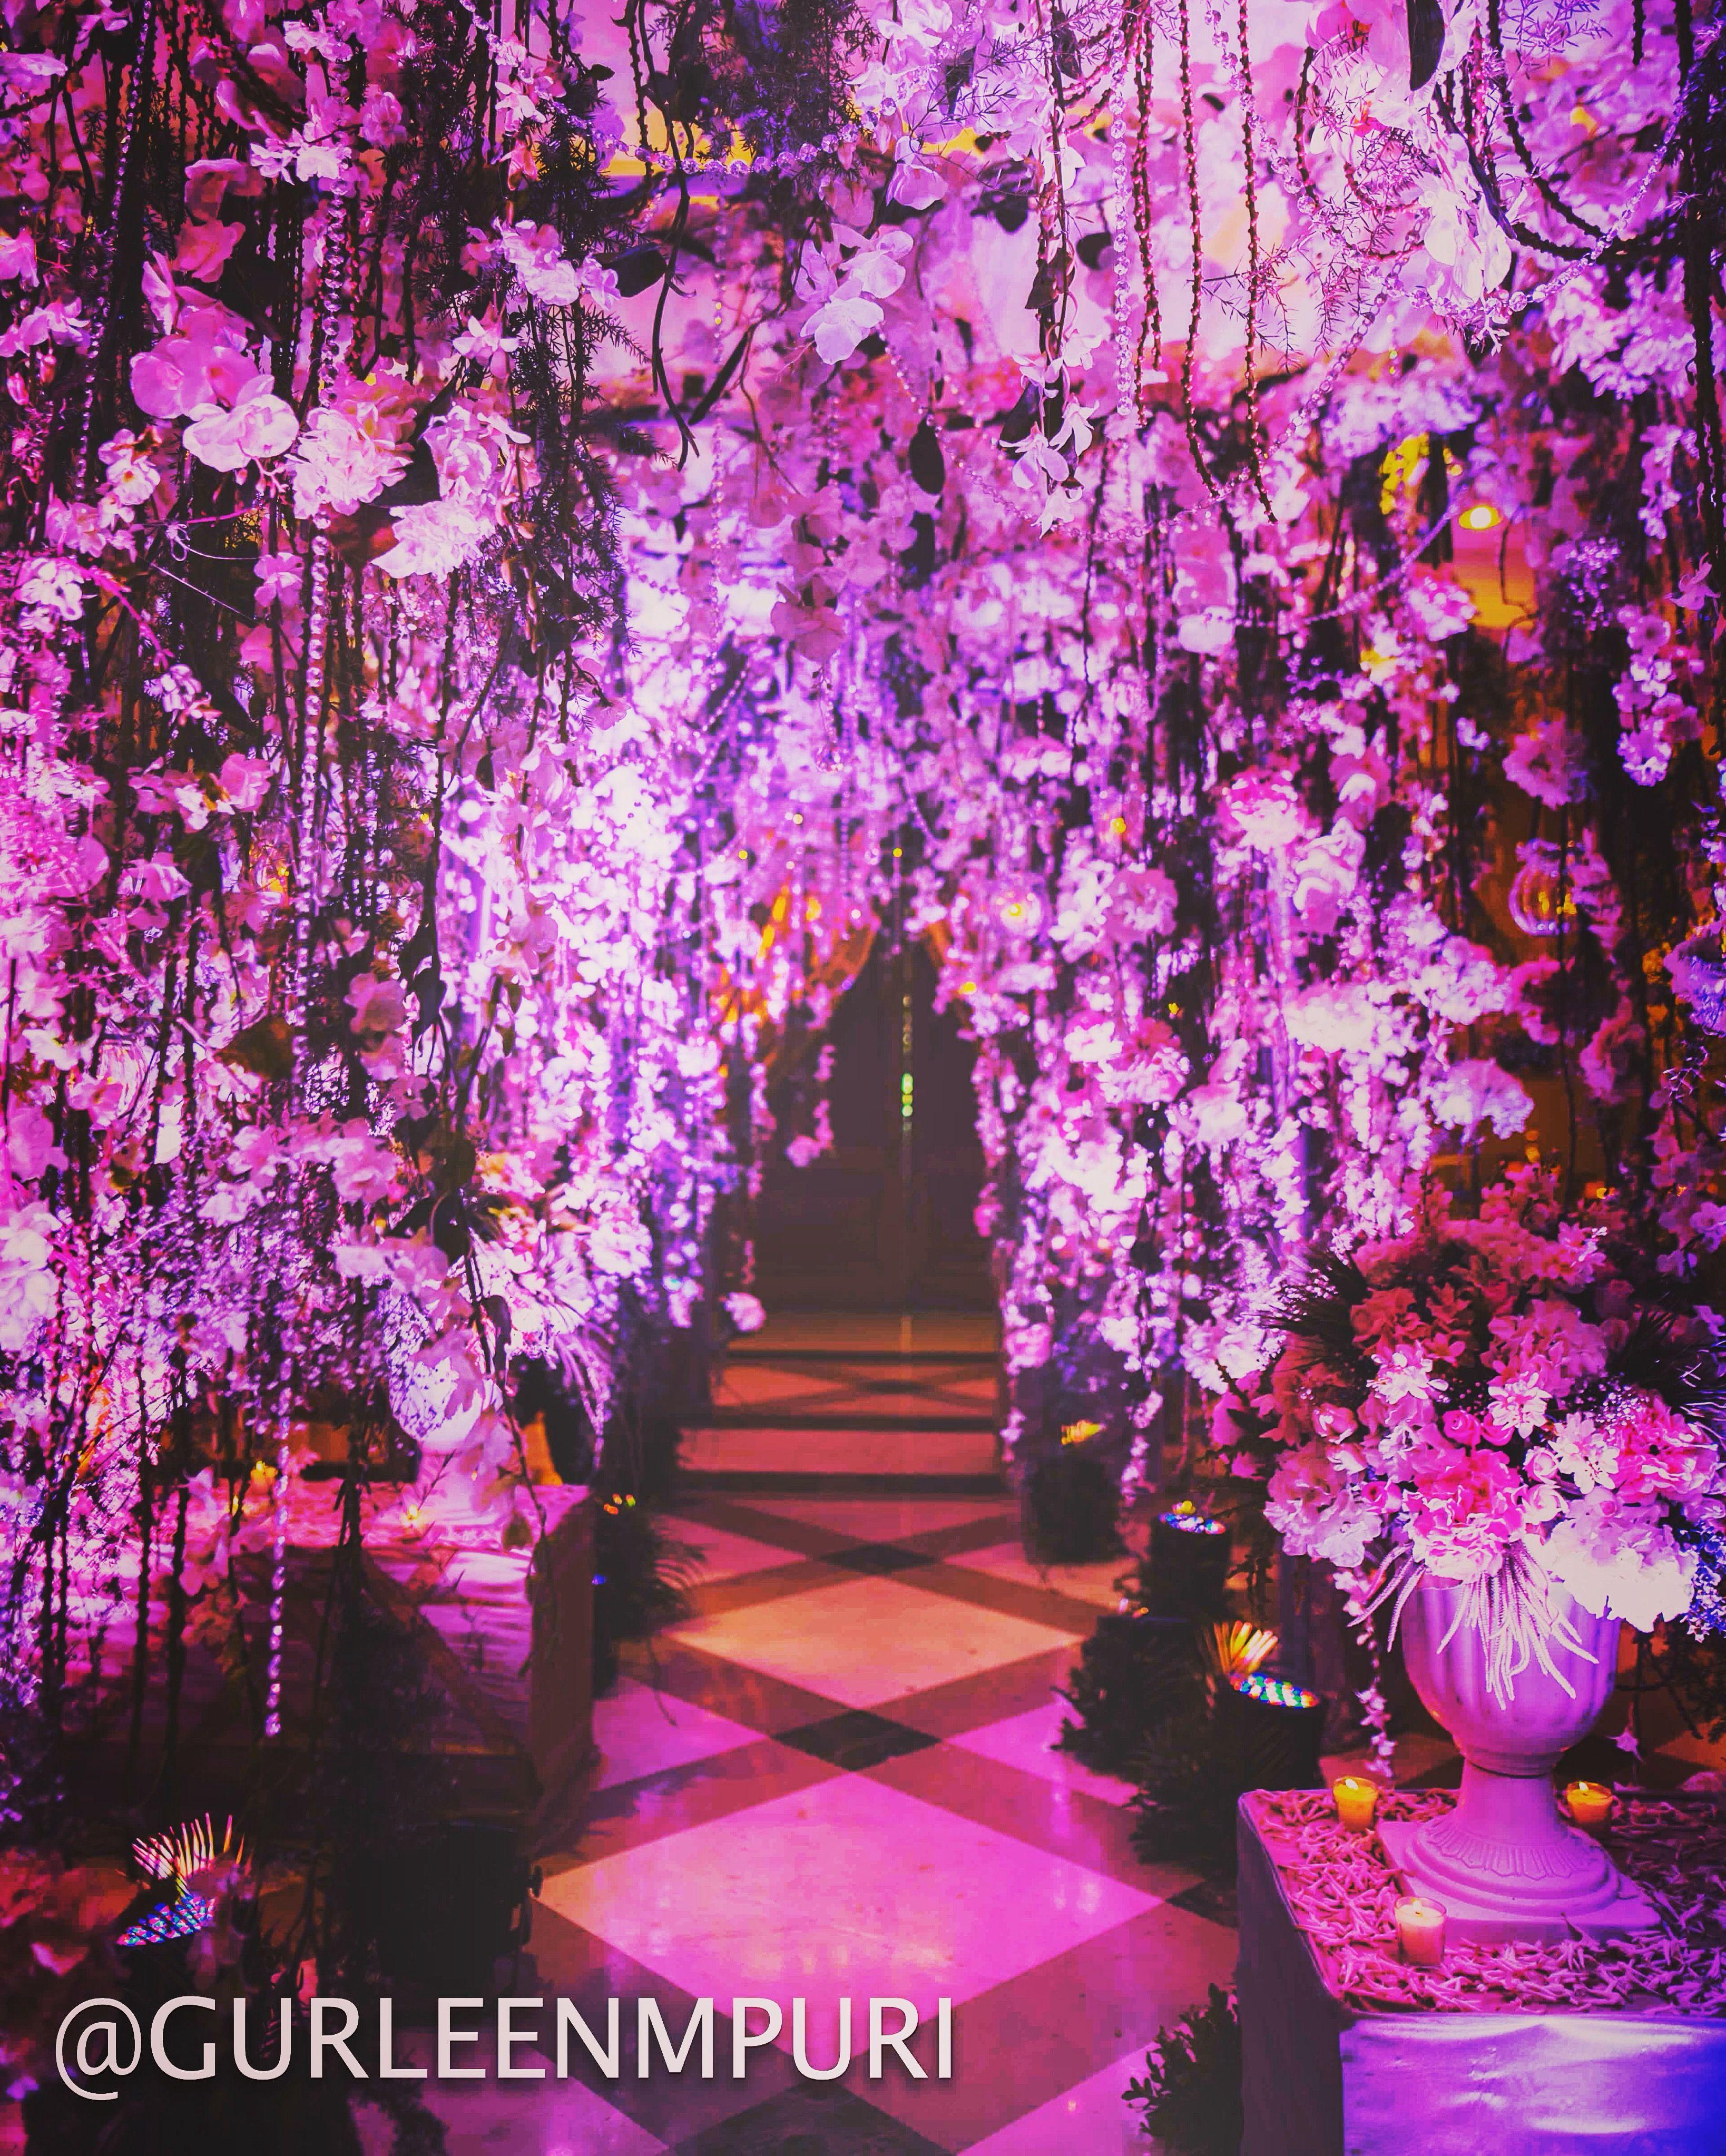 Pin by theju on wedding ideas | Pinterest | Weddings, Amazing ...